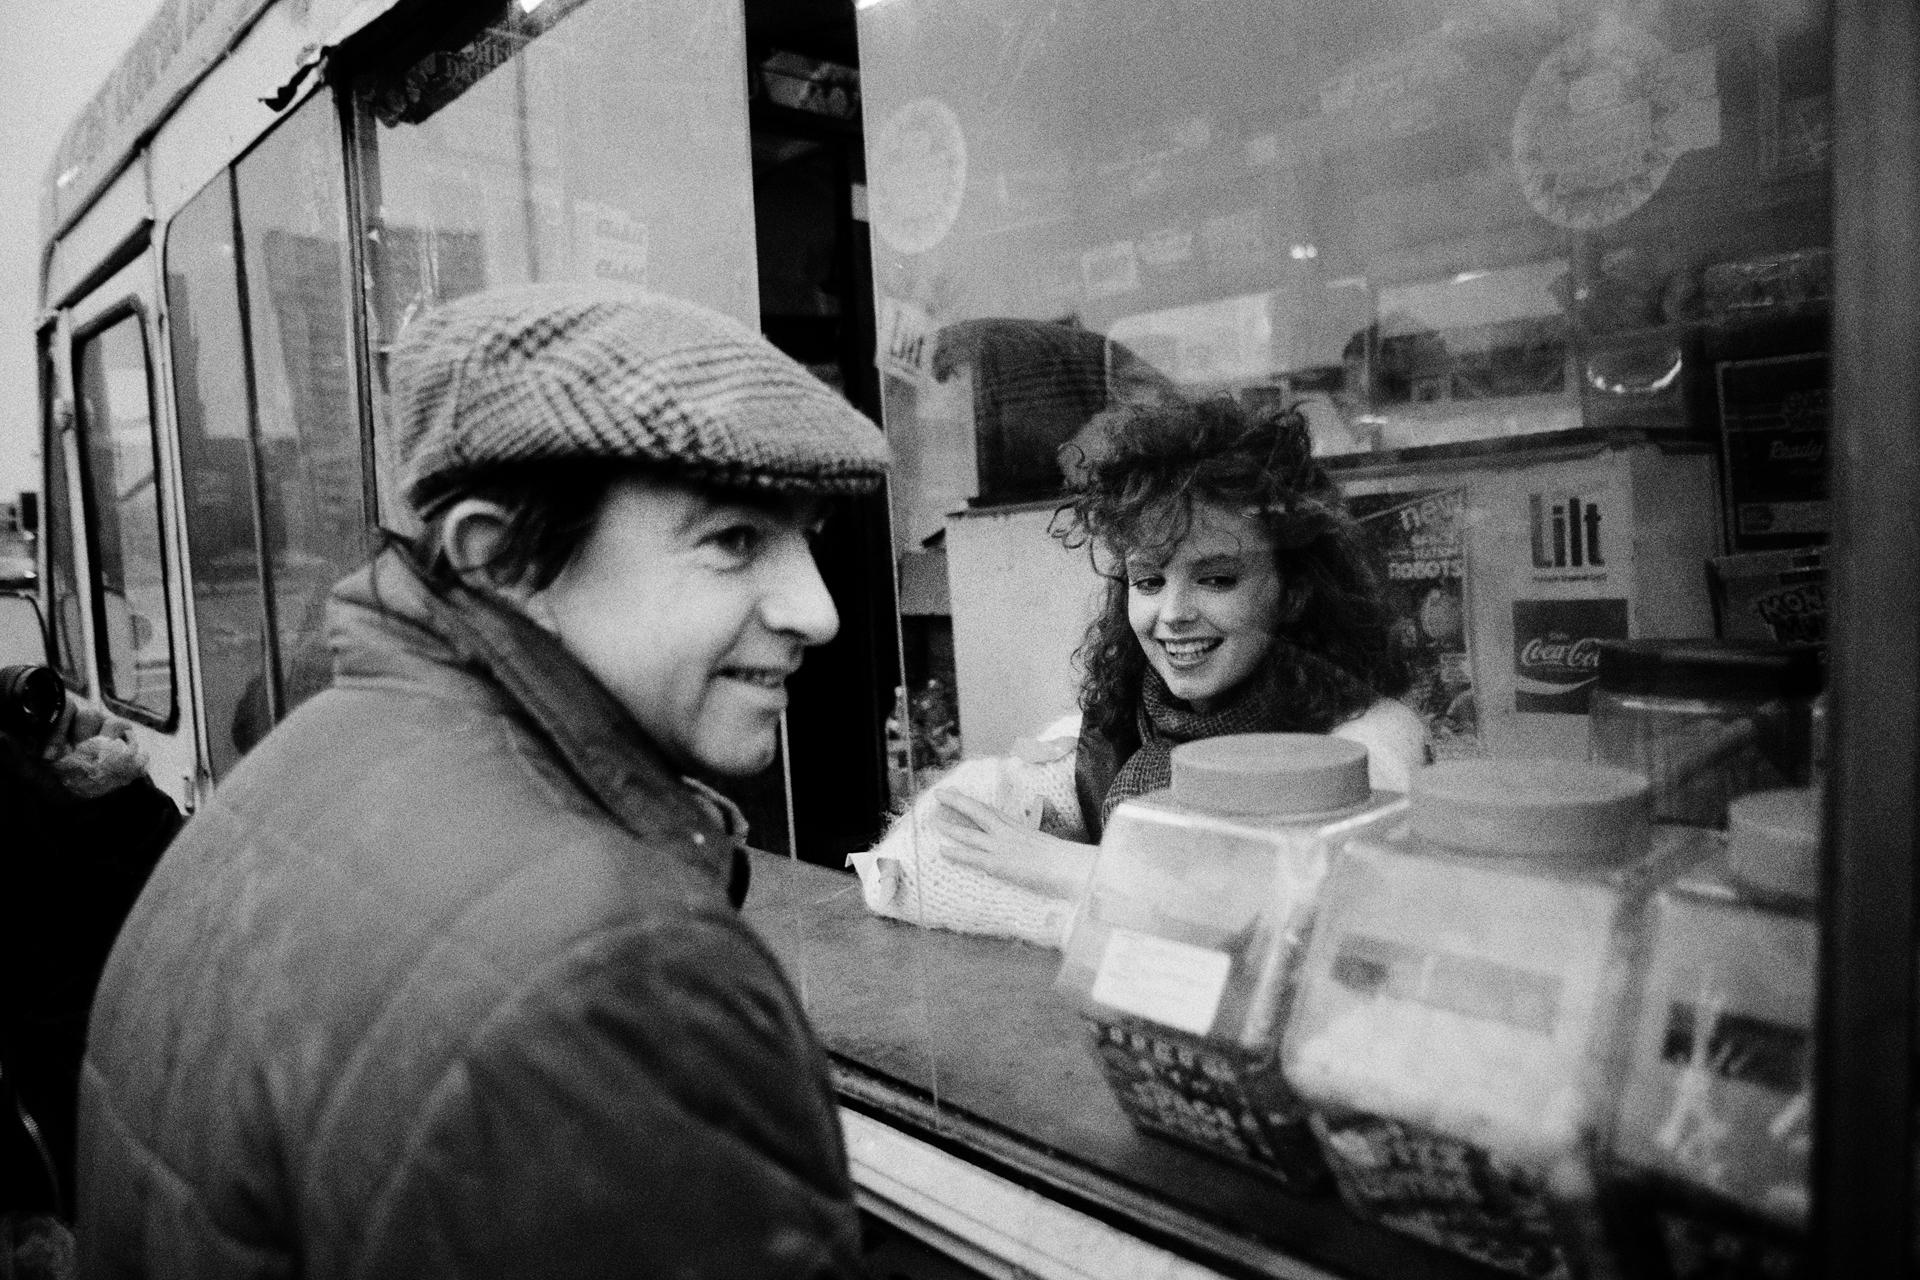 Oscar & Me: Paddy Higson